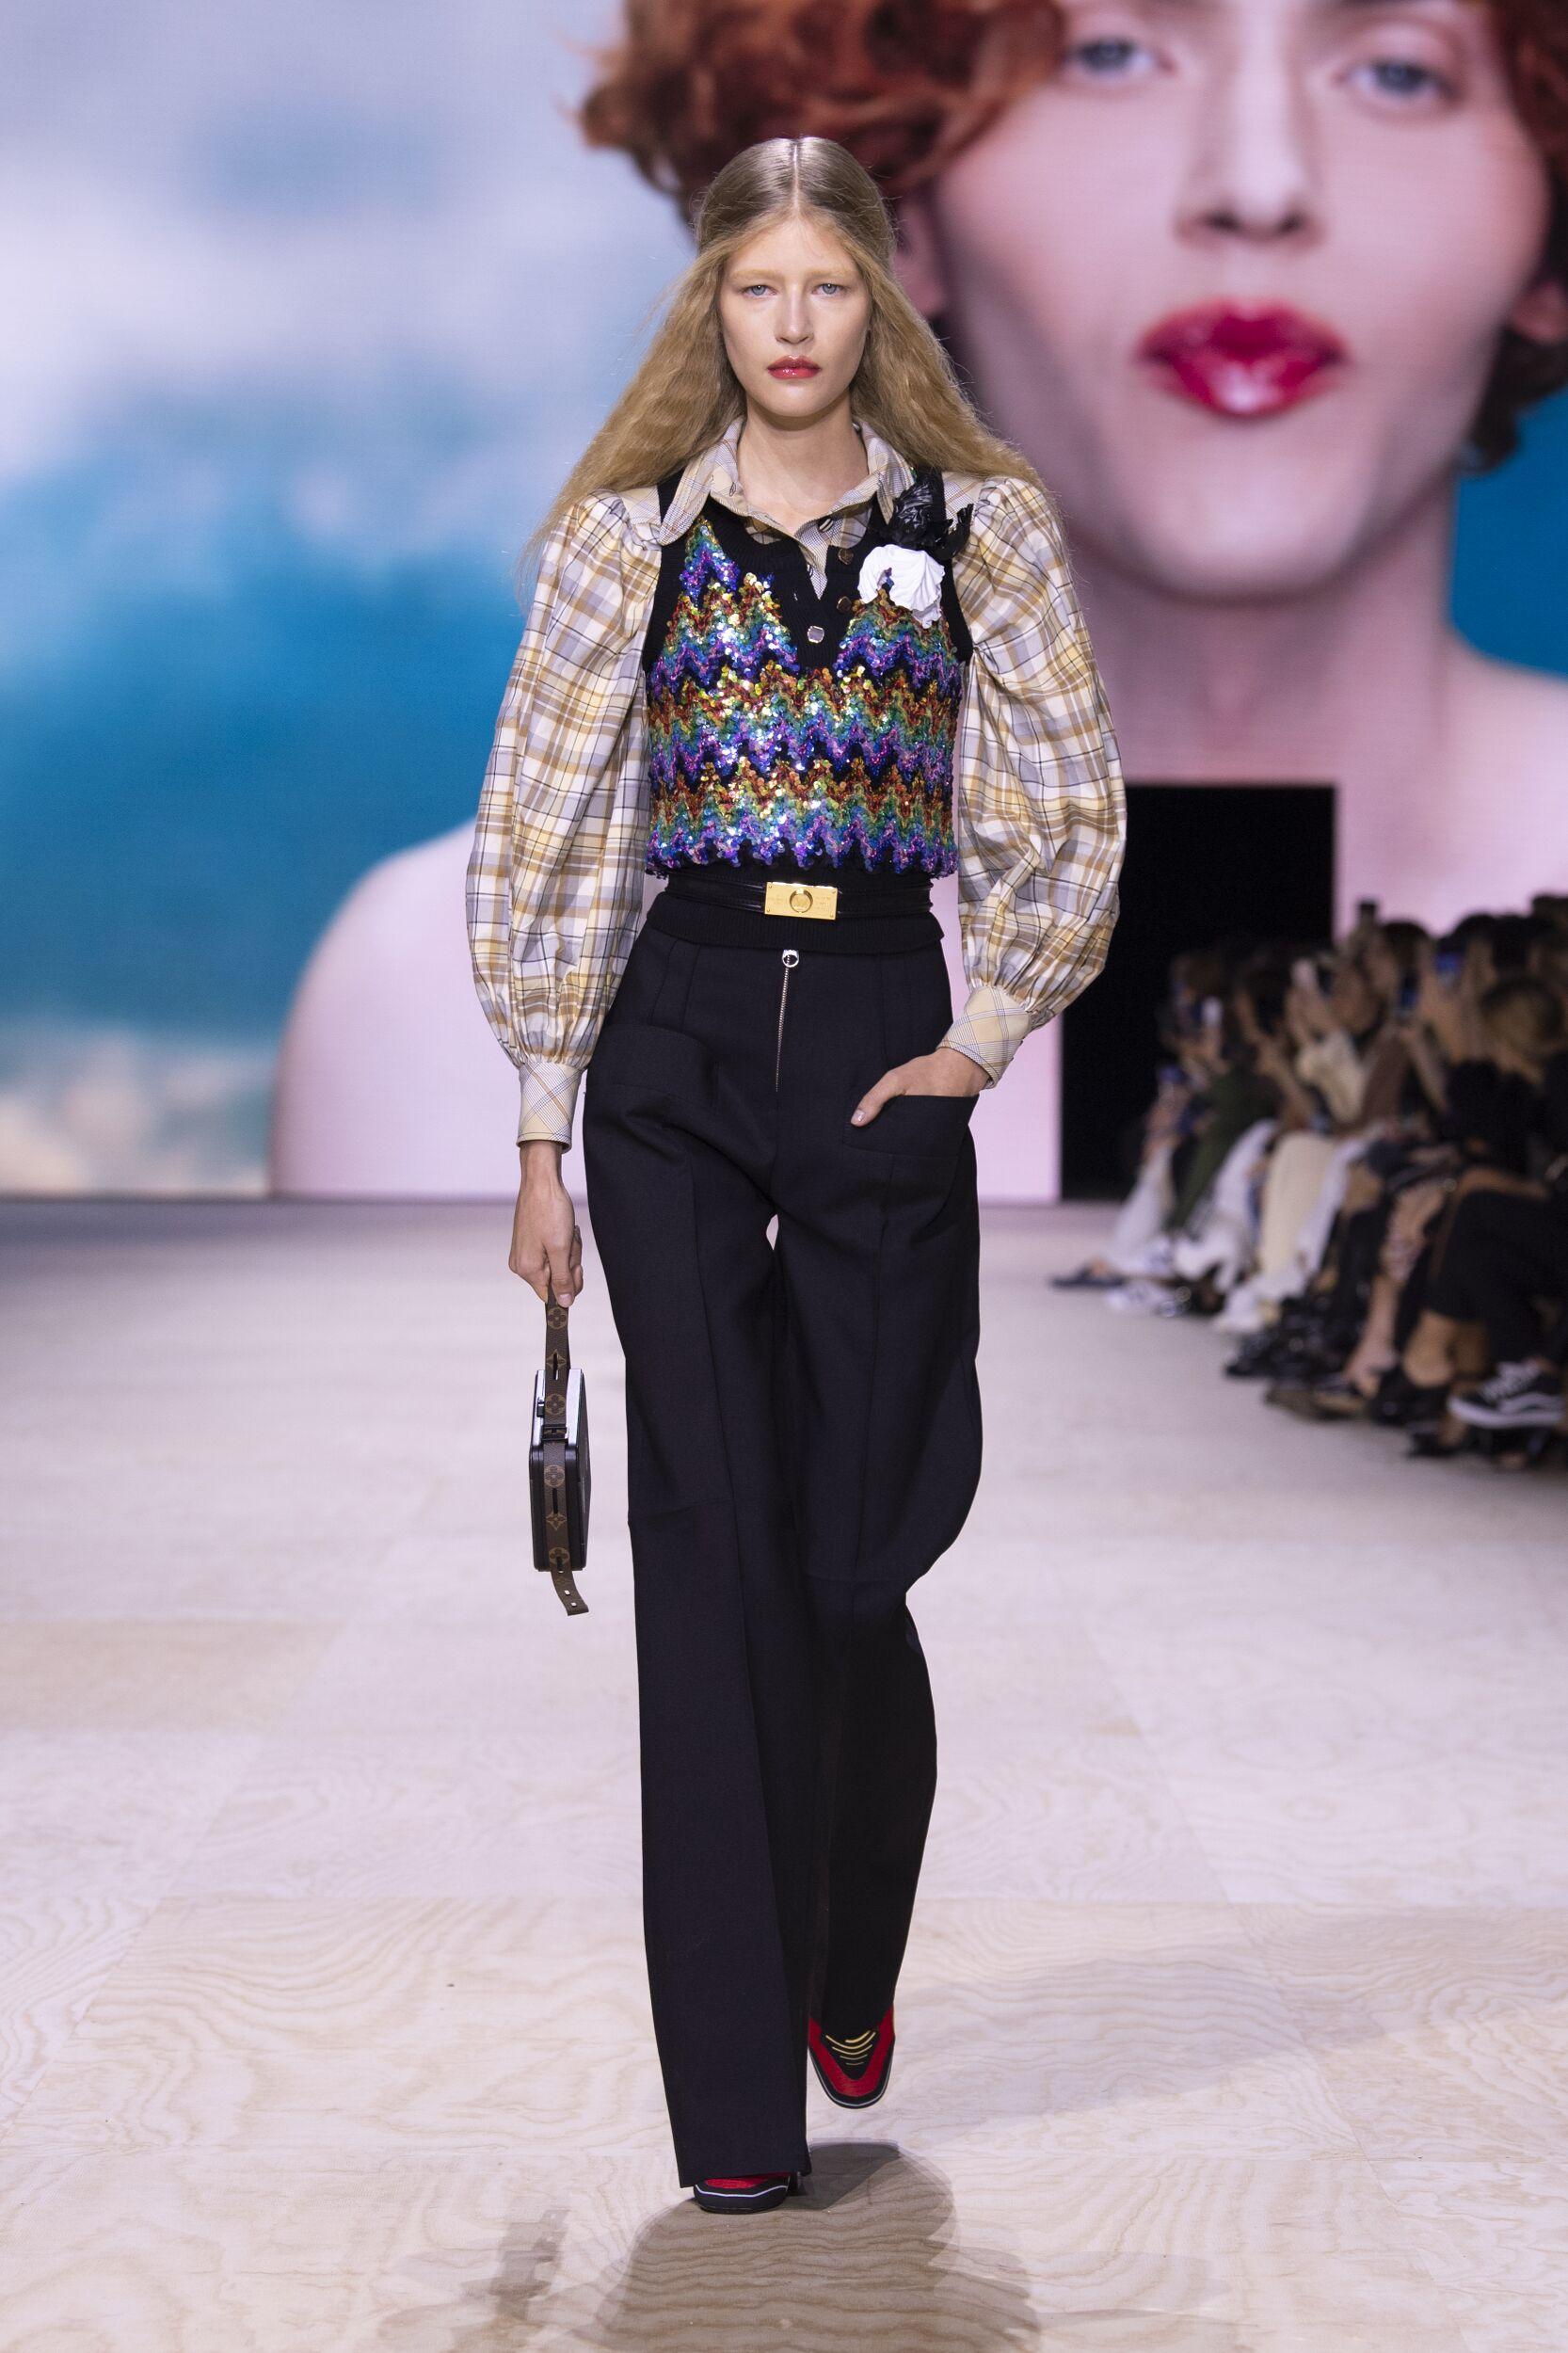 Louis Vuitton Fashion Show SS 2020